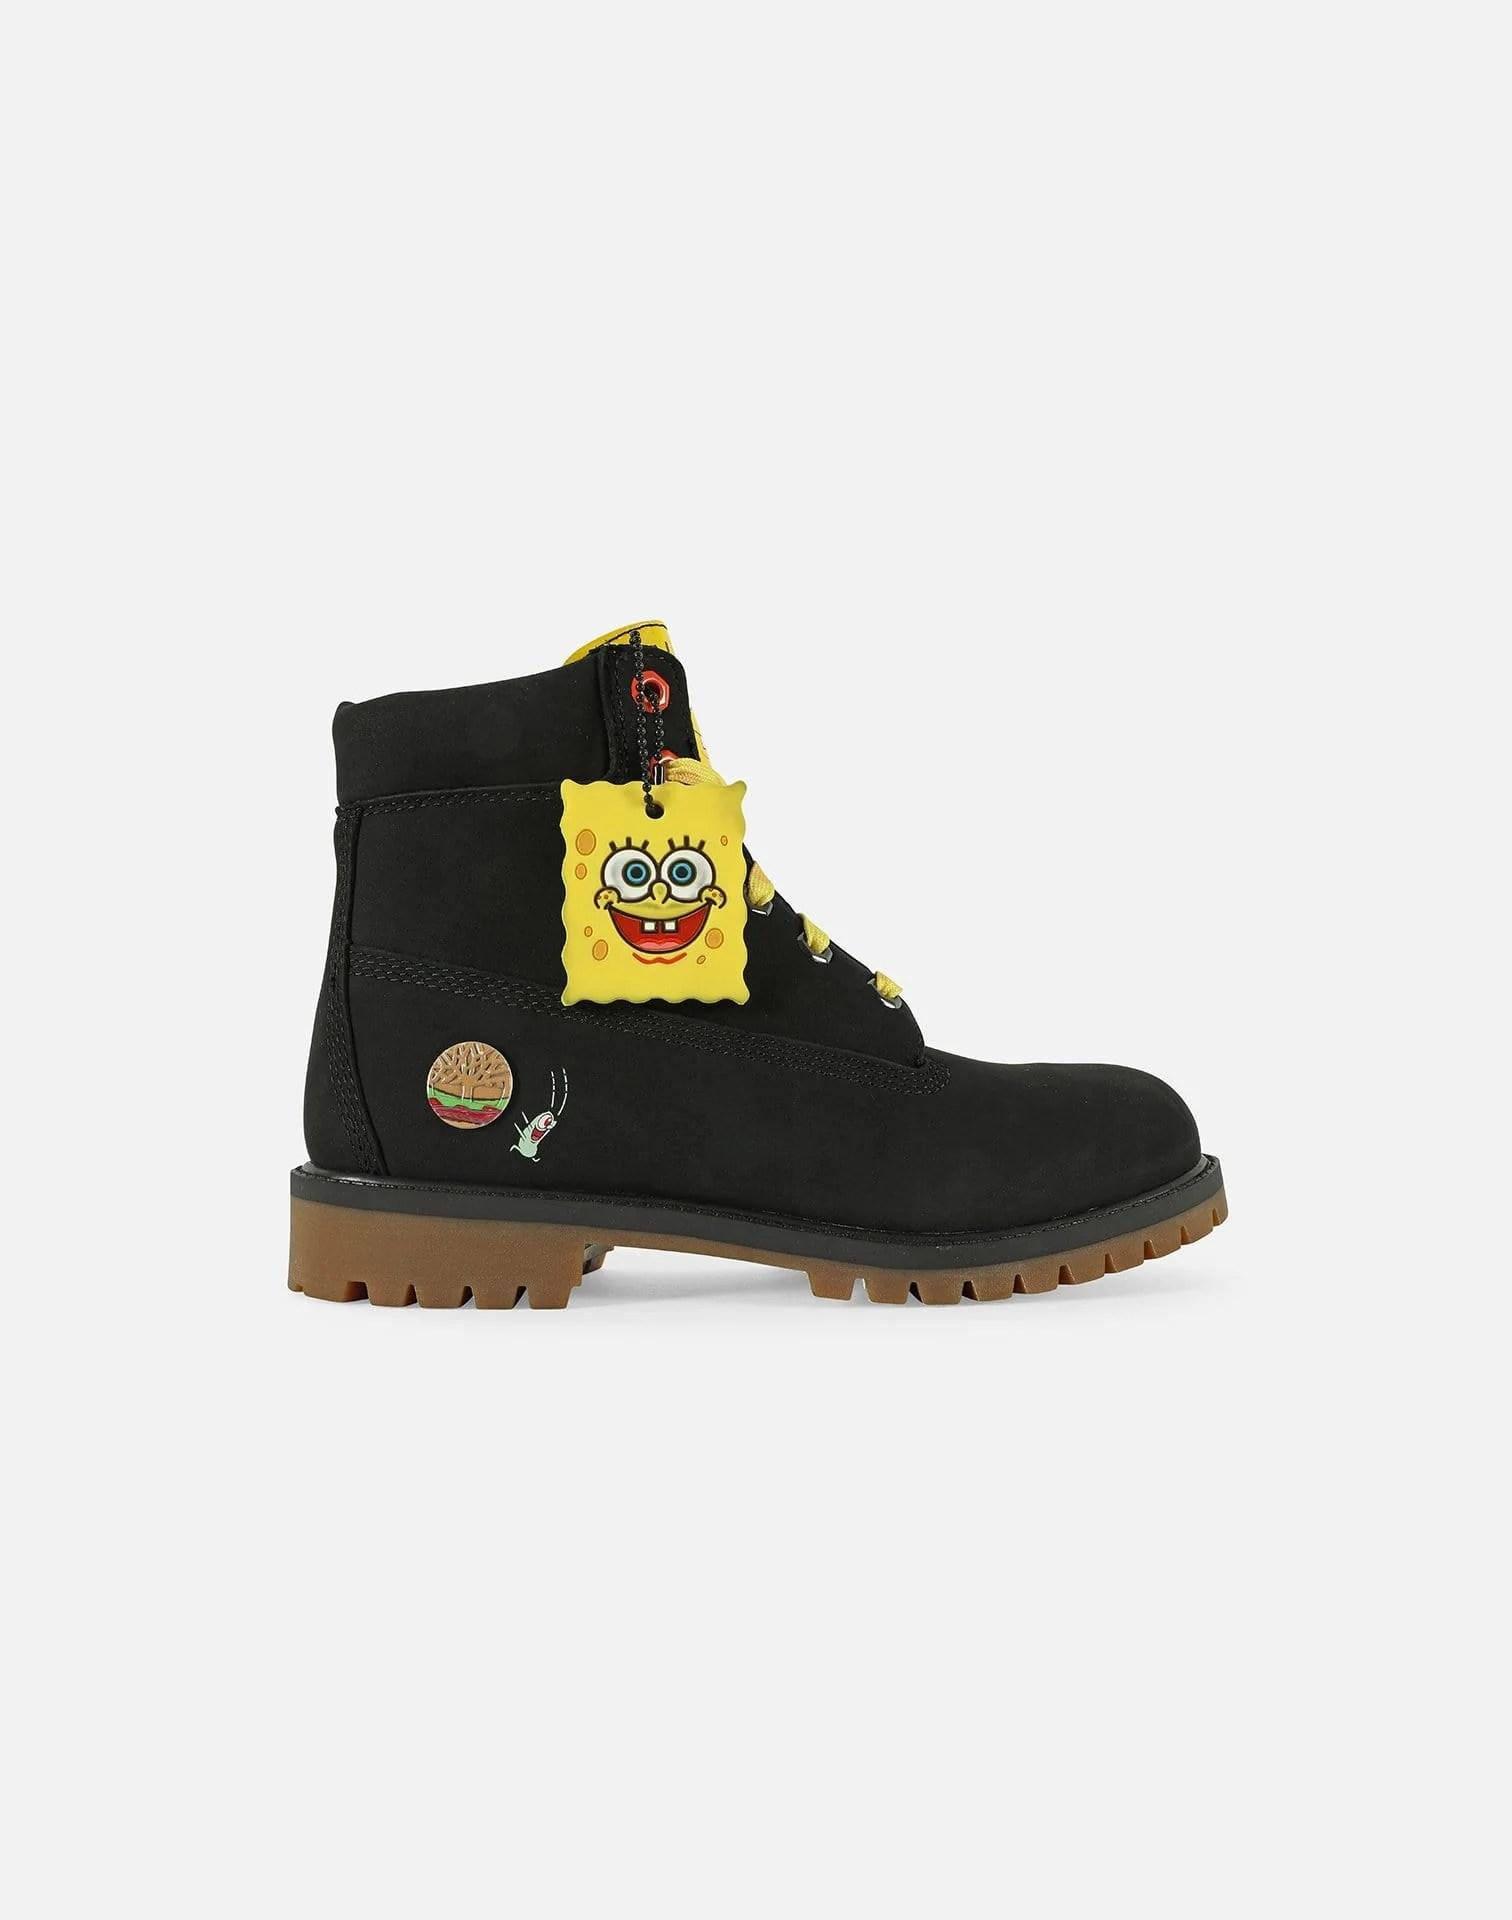 Spongebob Timberlands : spongebob, timberlands, SPONGEBOB, SQUAREPANTS, PREMIUM, BOOTS, GRADE-SCHOOL